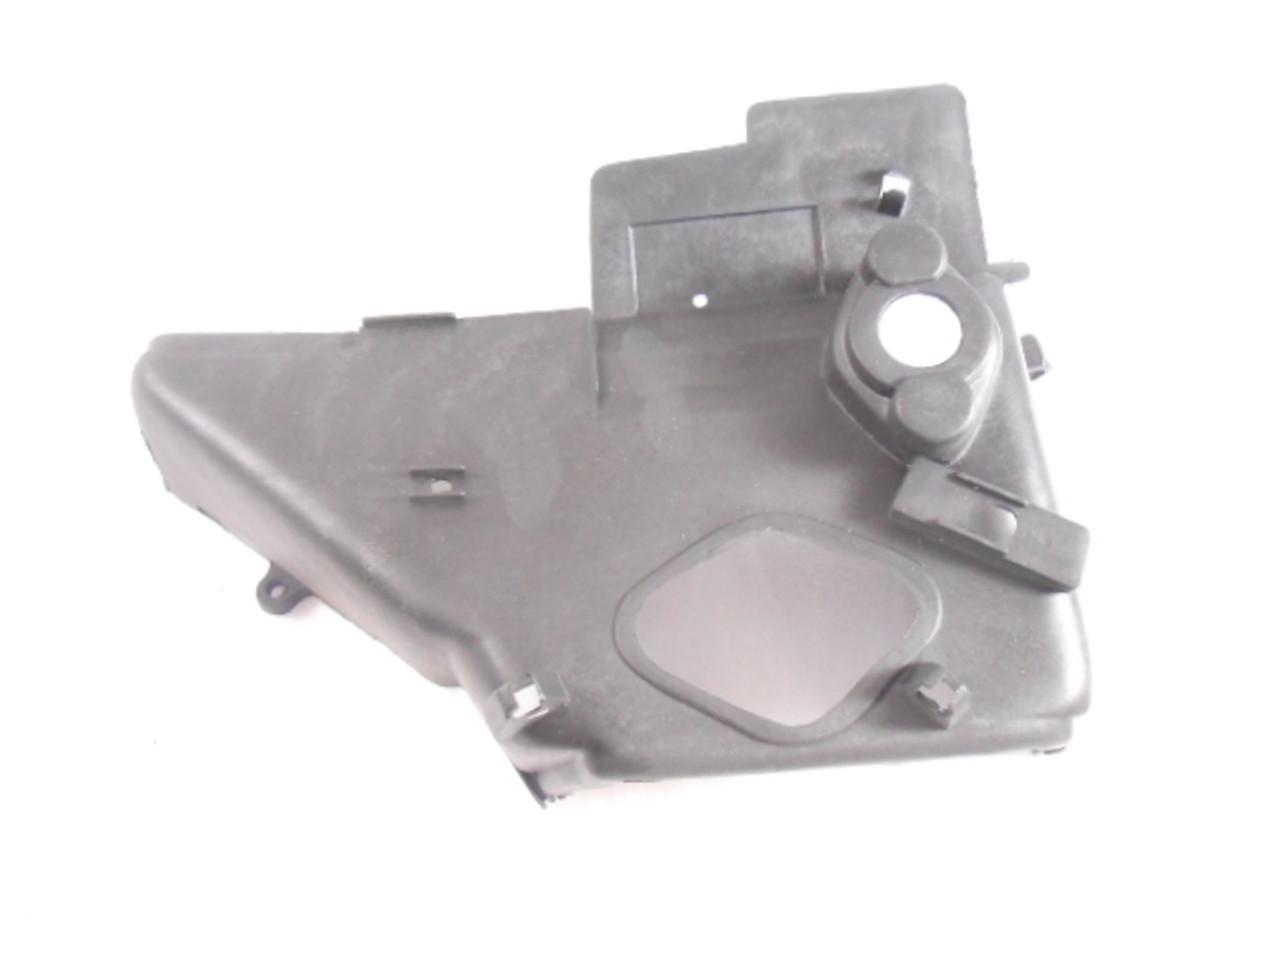 ENGINE SHROUD /COVER 12660-A148-14